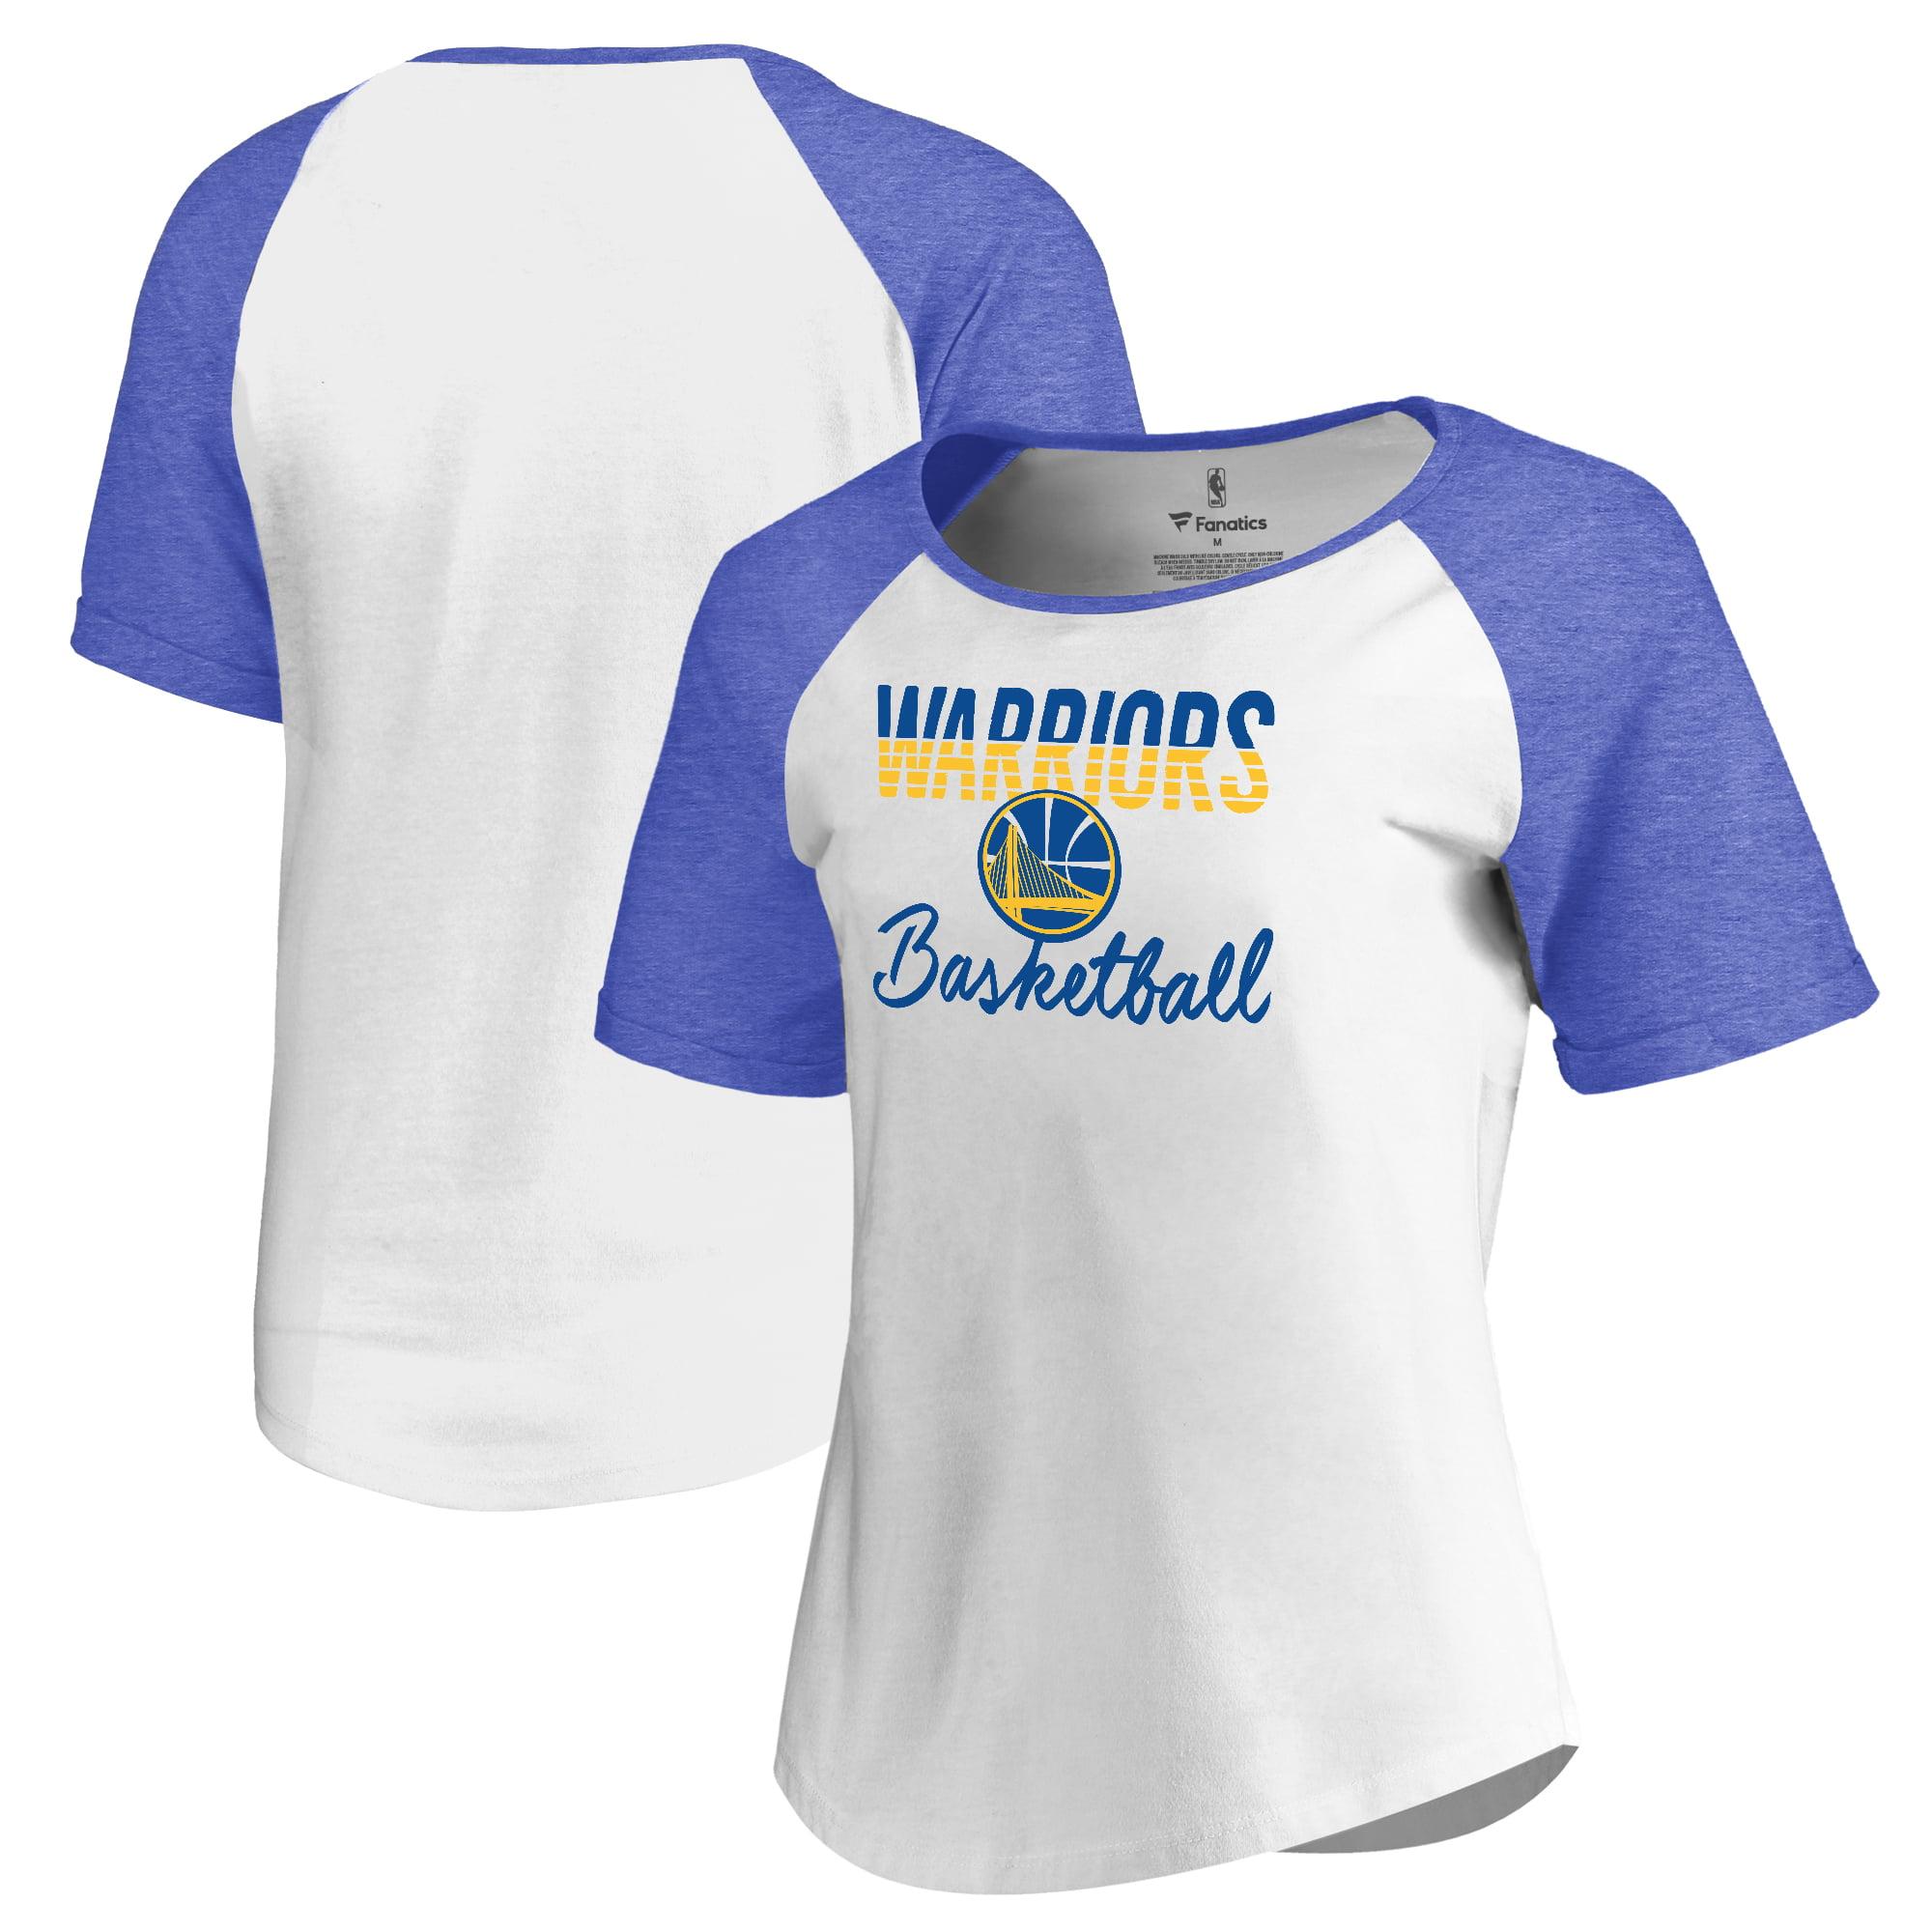 Golden State Warriors Fanatics Branded Women's Free Line Raglan Scoop Neck Tri-Blend T-Shirt - White/Royal